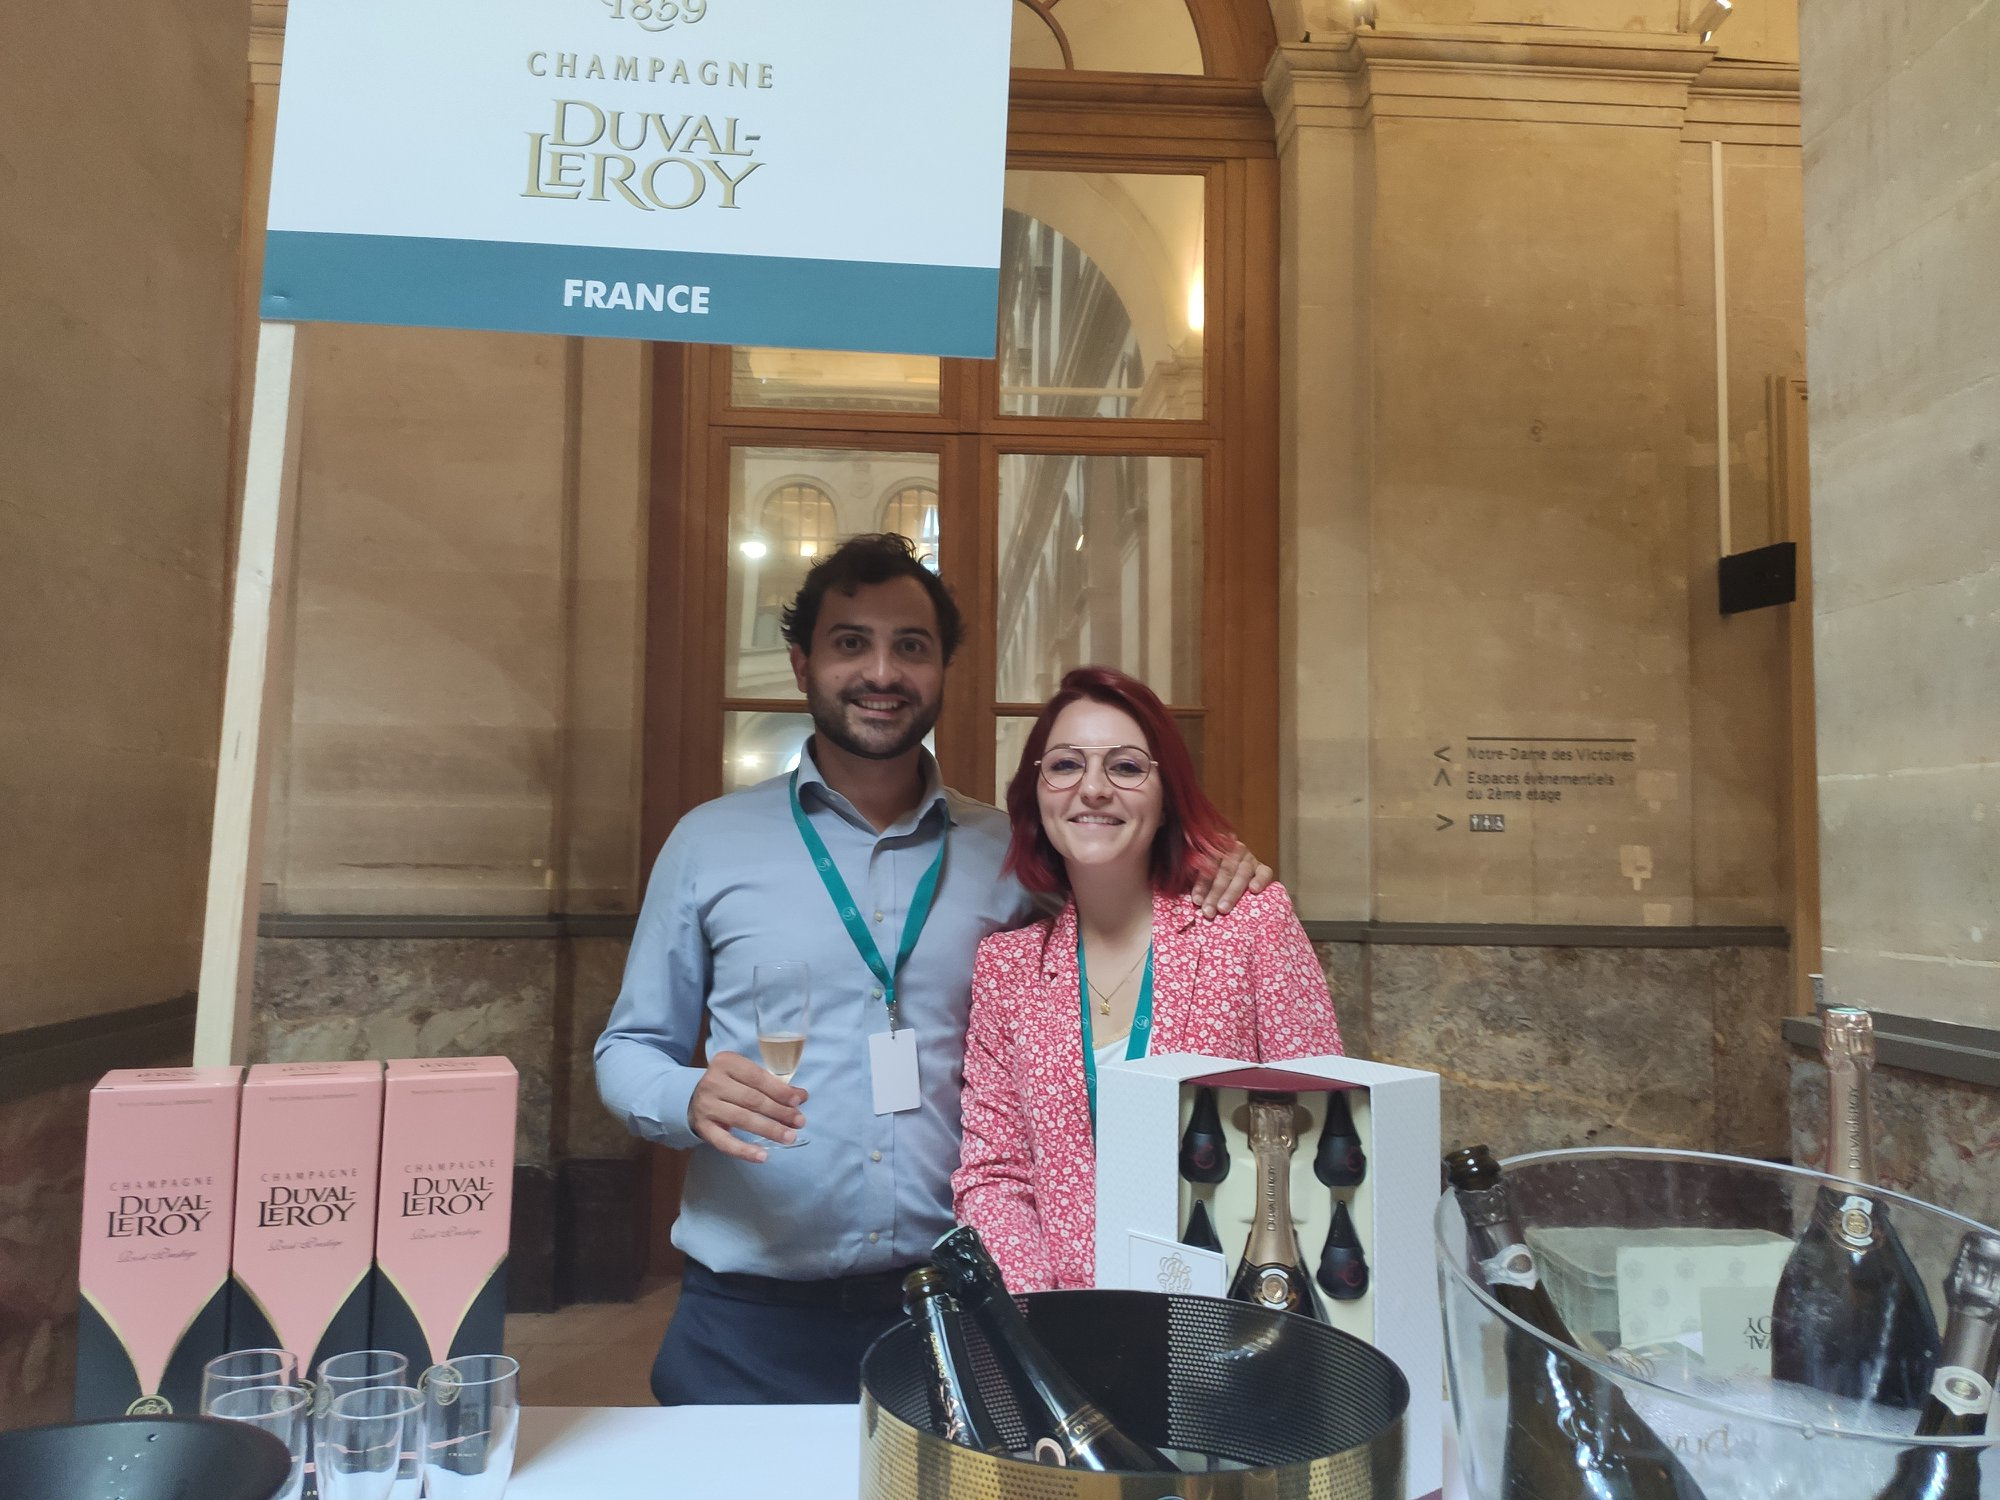 Champagnes Duval-Leroy - Dugas Club expert